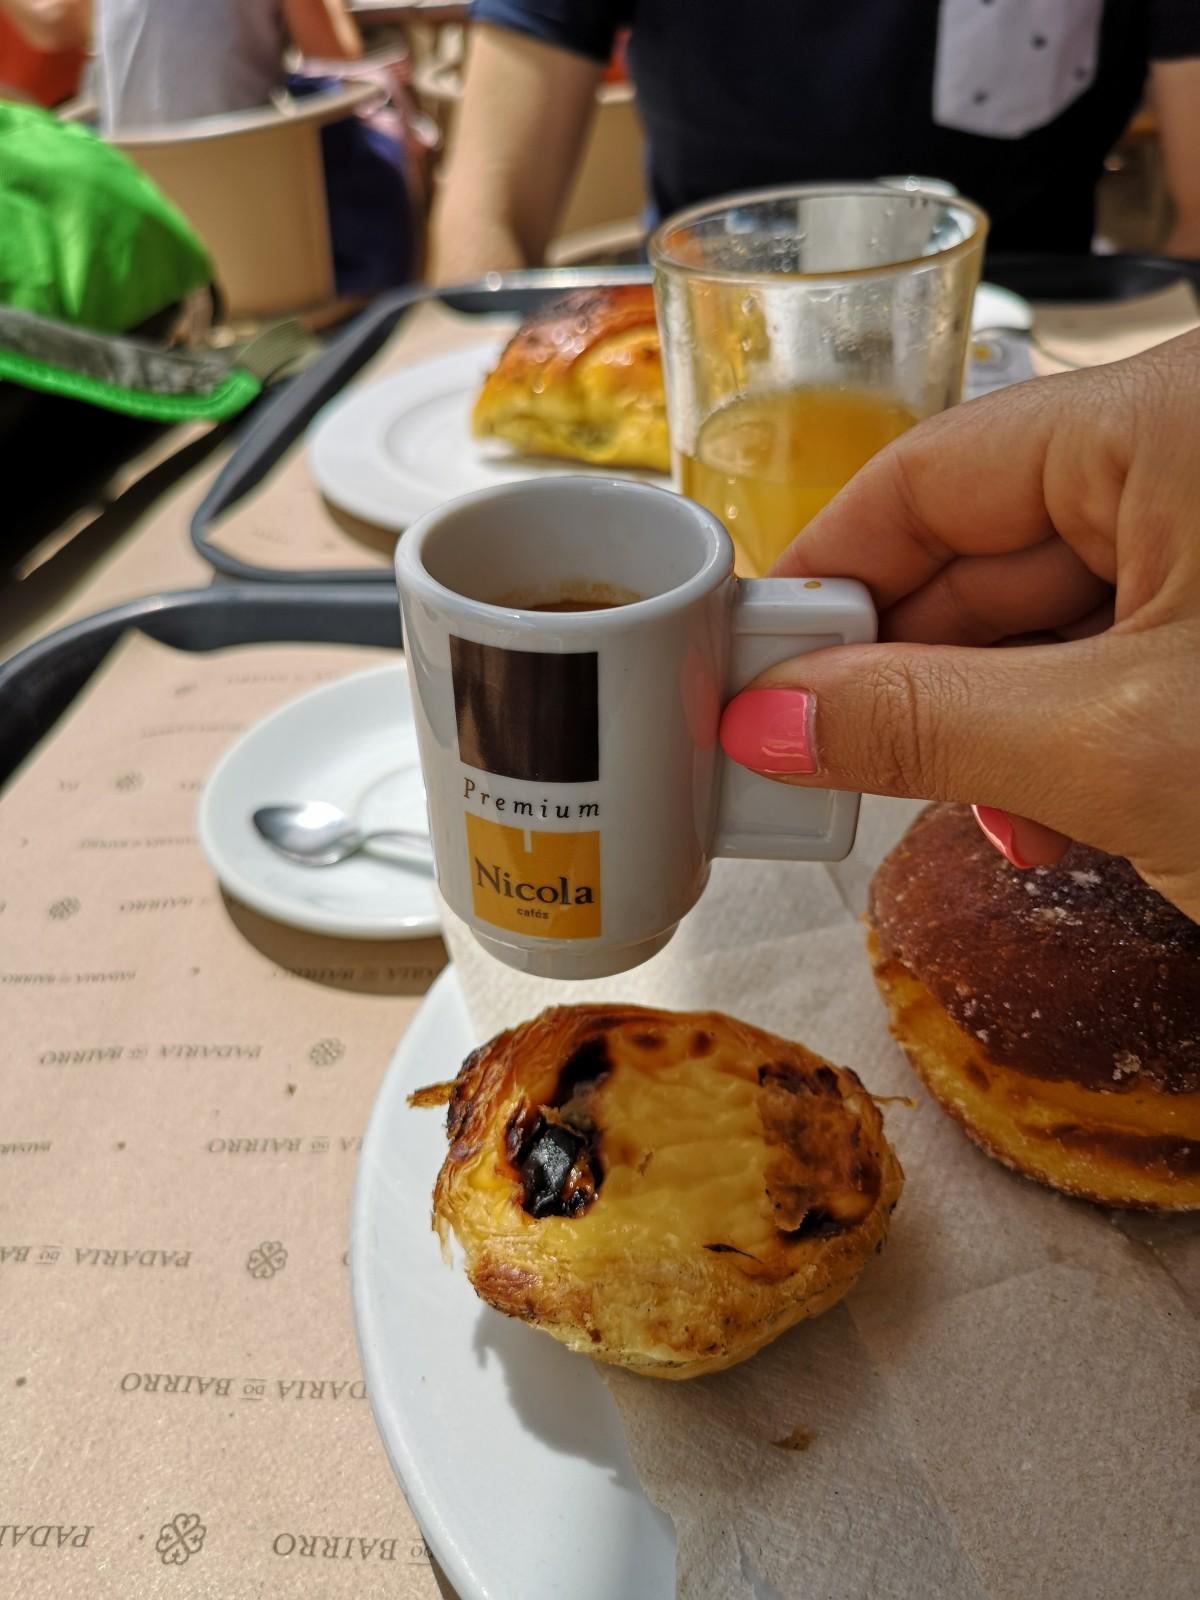 Pomarančni sok, kava, pastie de nata.